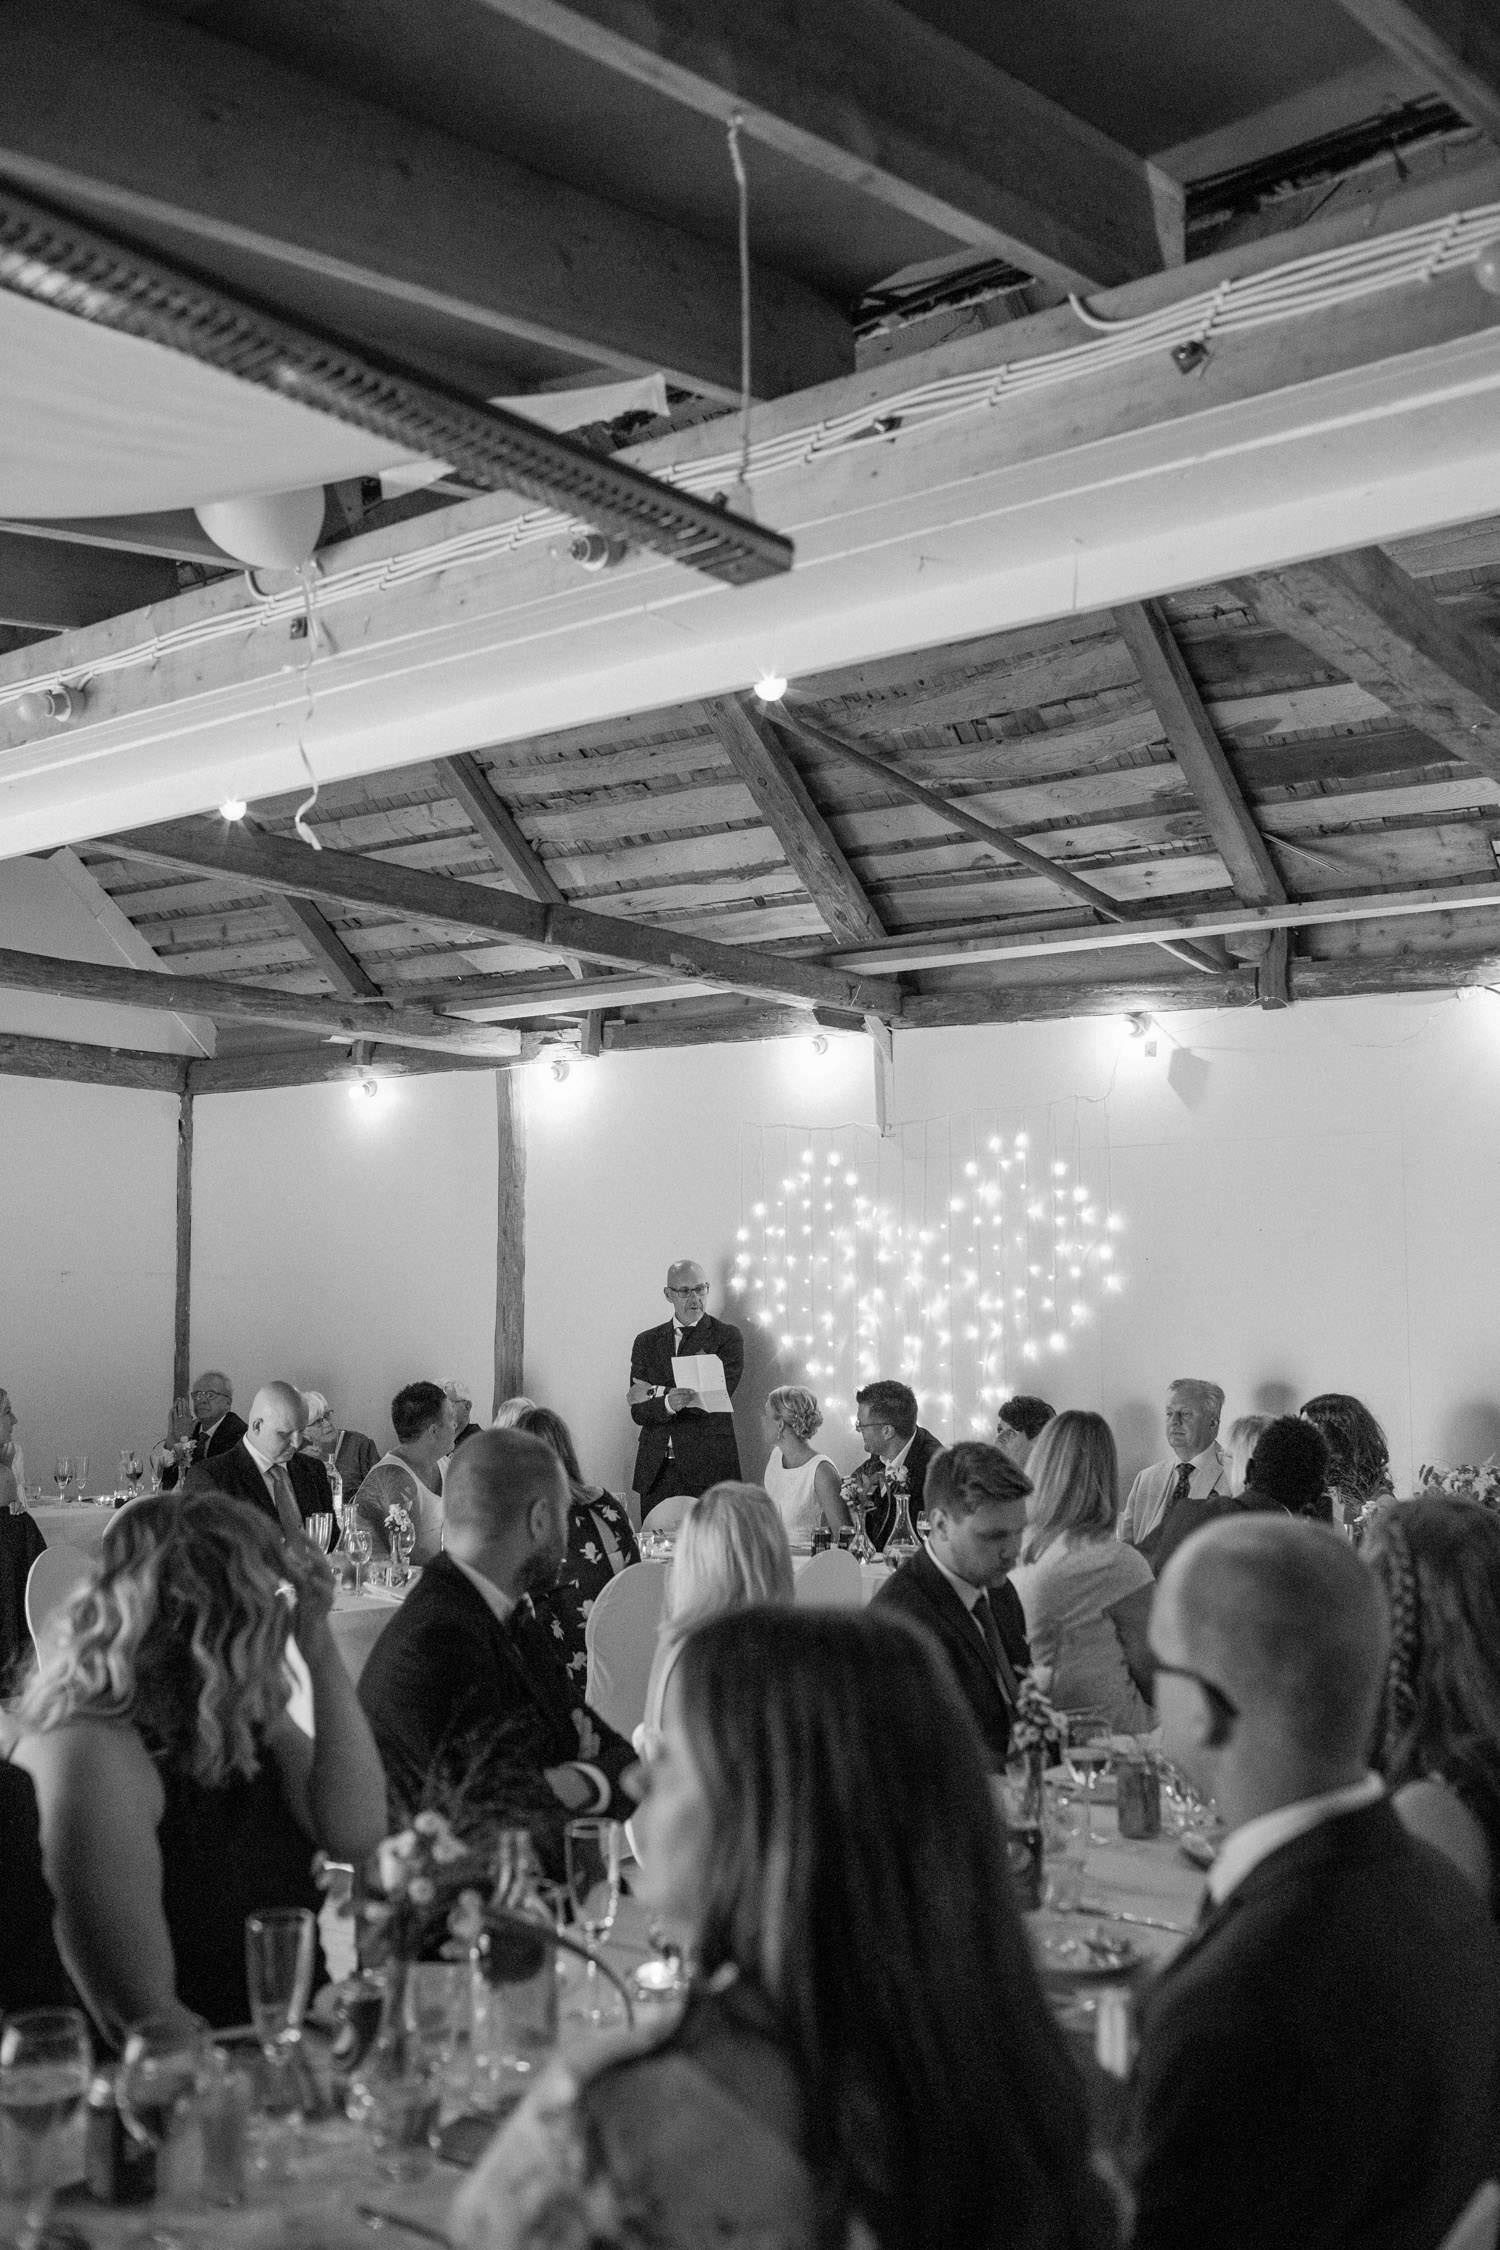 Bröllopsfest på Kaffetorpet Oknö utanför Mönsterås, Småland.